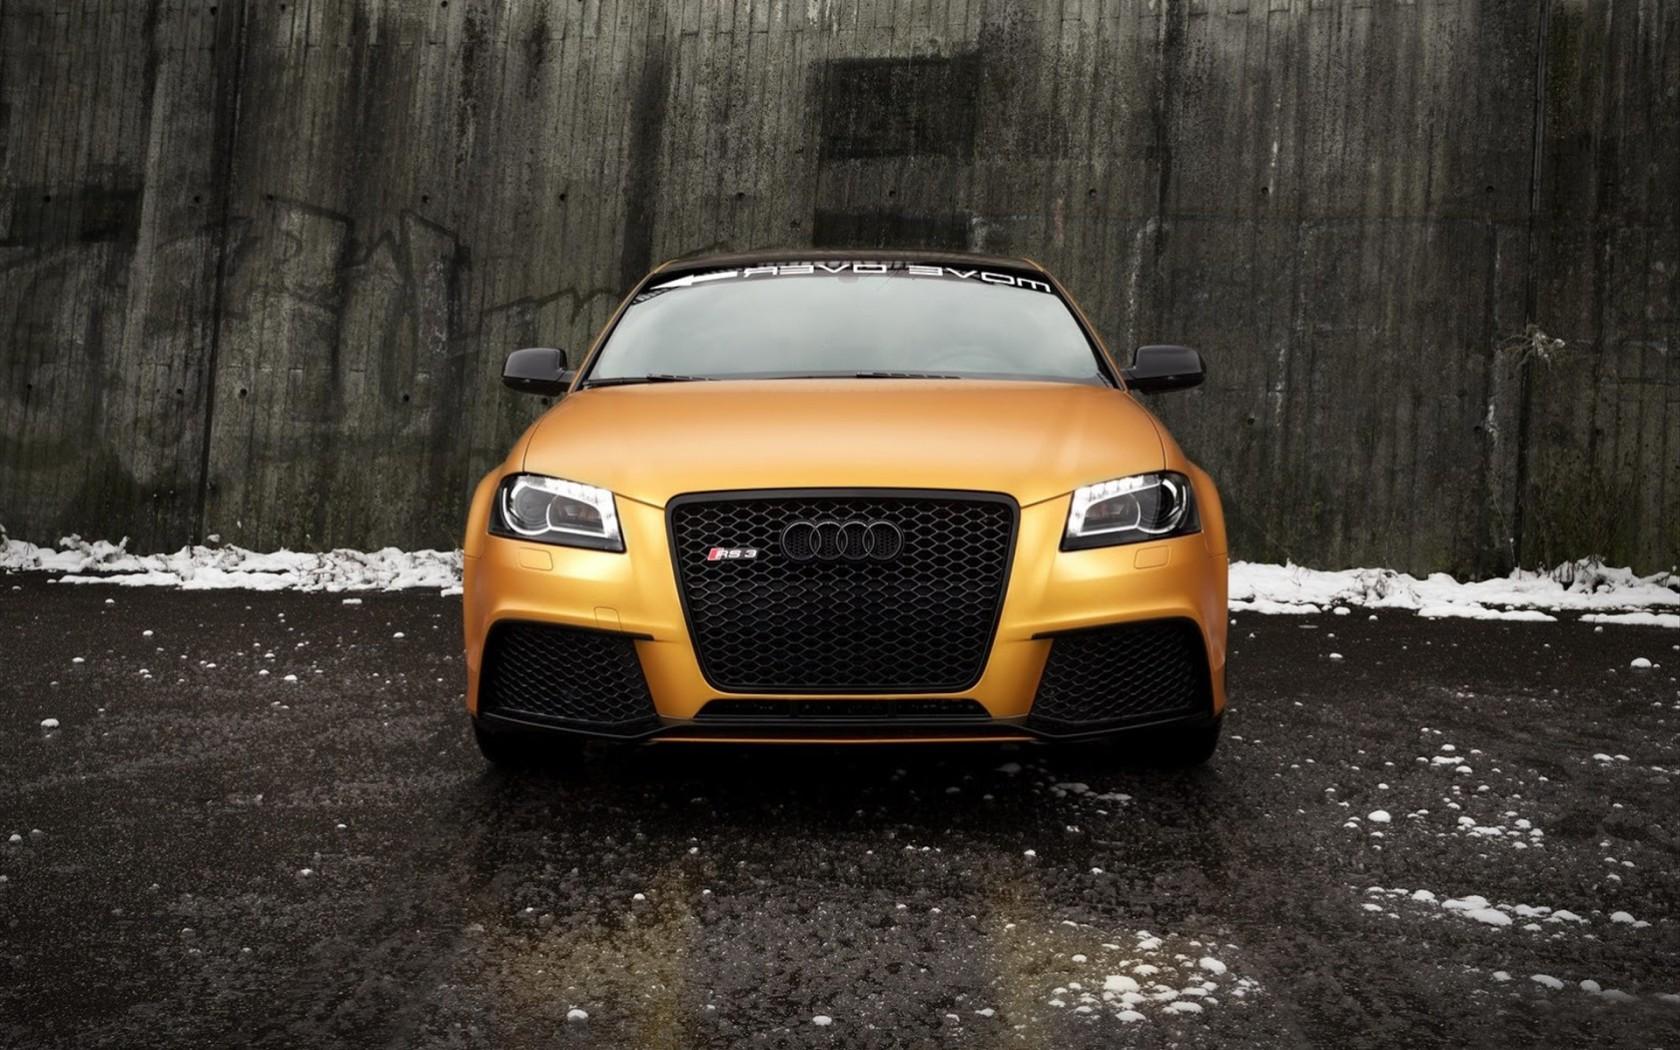 2013 Audi Rs3 Sportback By Schwabenfolia Wallpaper Hd